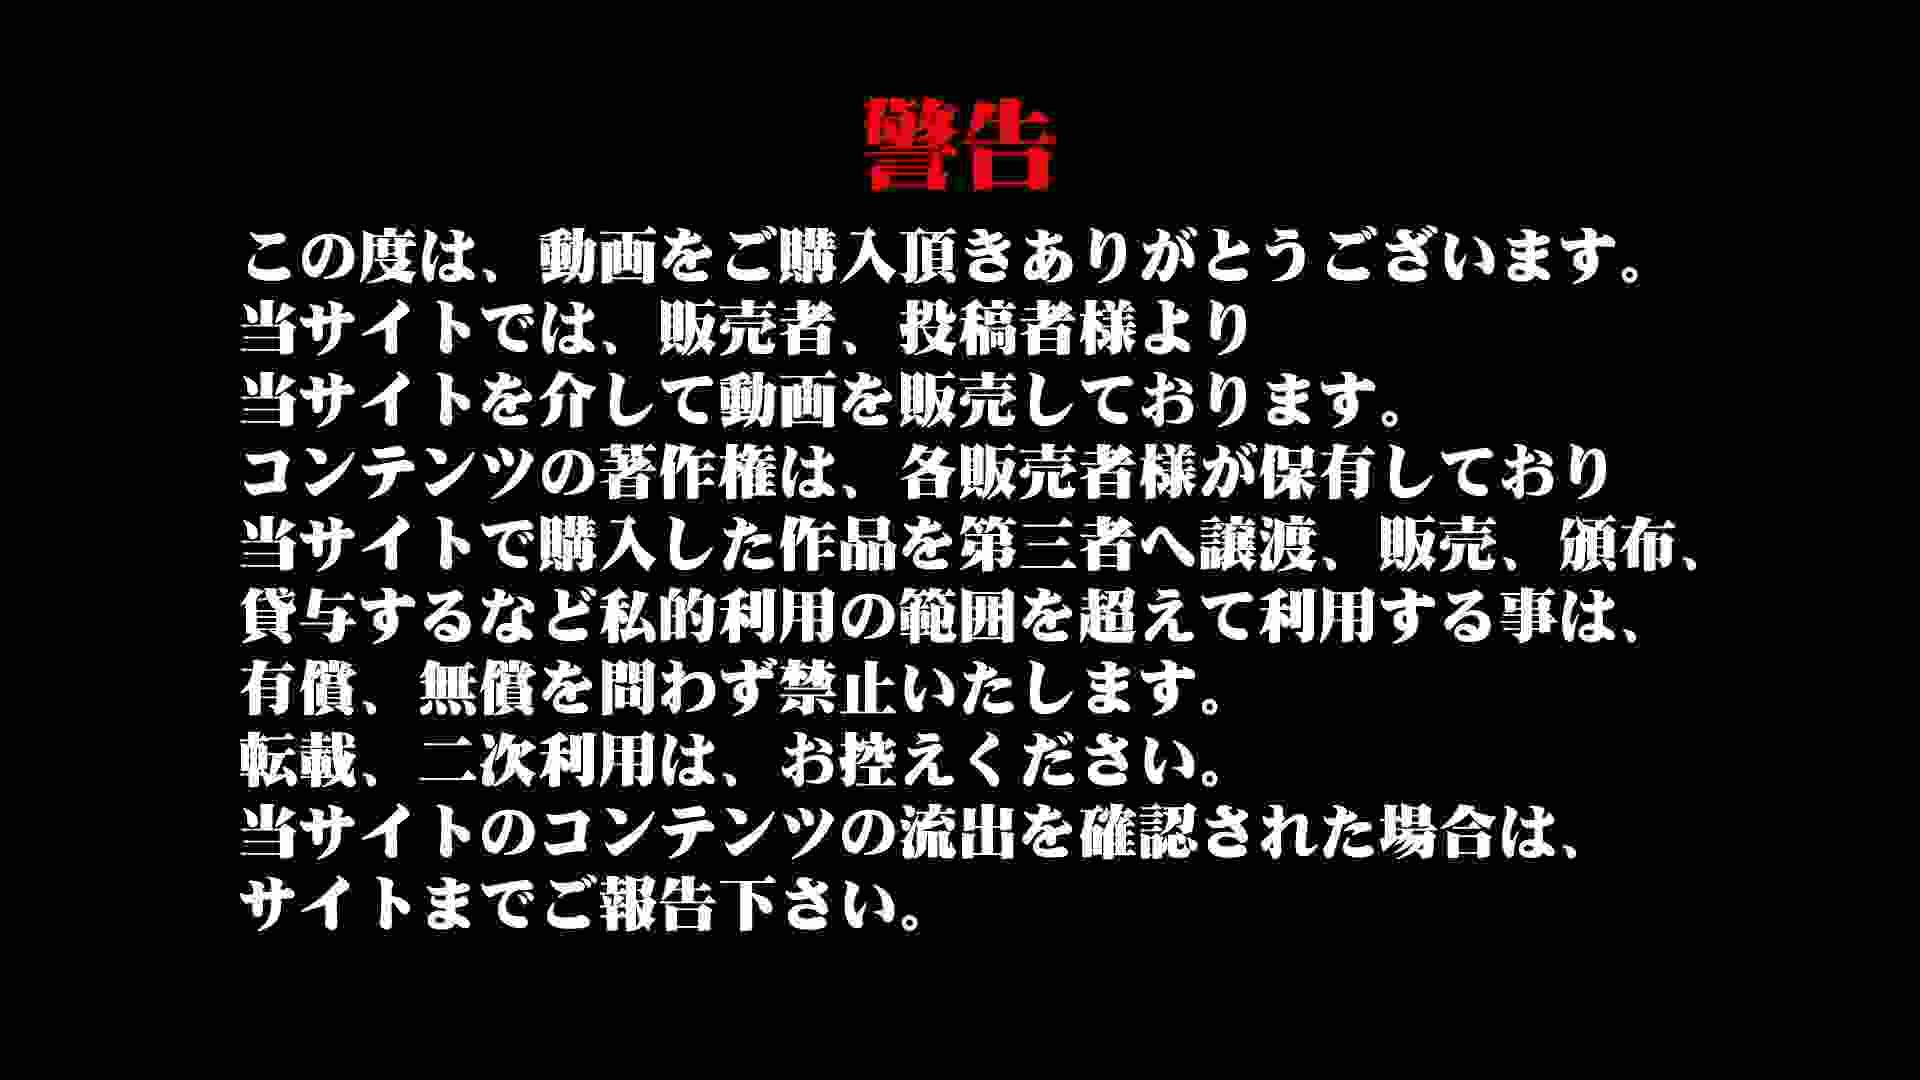 Aquaな露天風呂Vol.892 盗撮 われめAV動画紹介 80画像 2